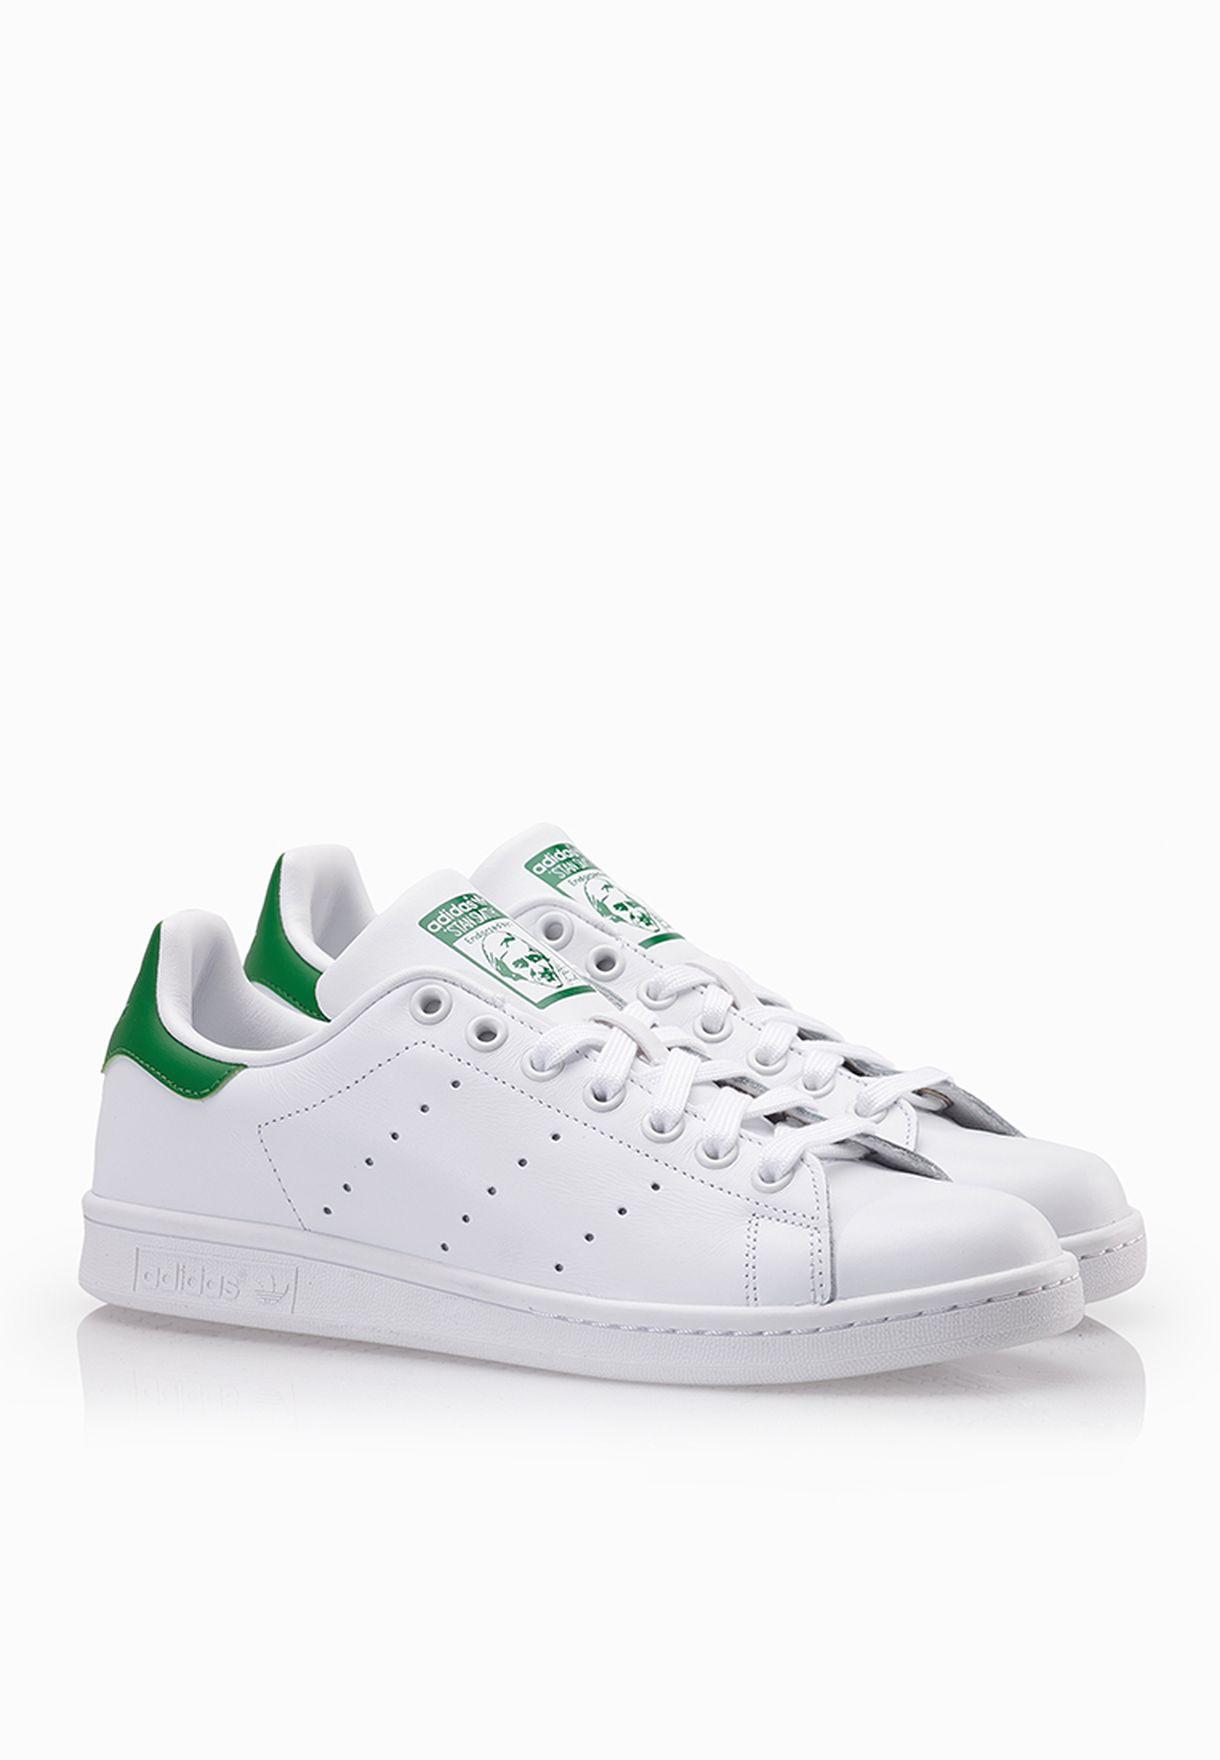 d5dd461ea تسوق حذاء Stan Smith ماركة اديداس اورجينال لون أبيض M20324 في ...